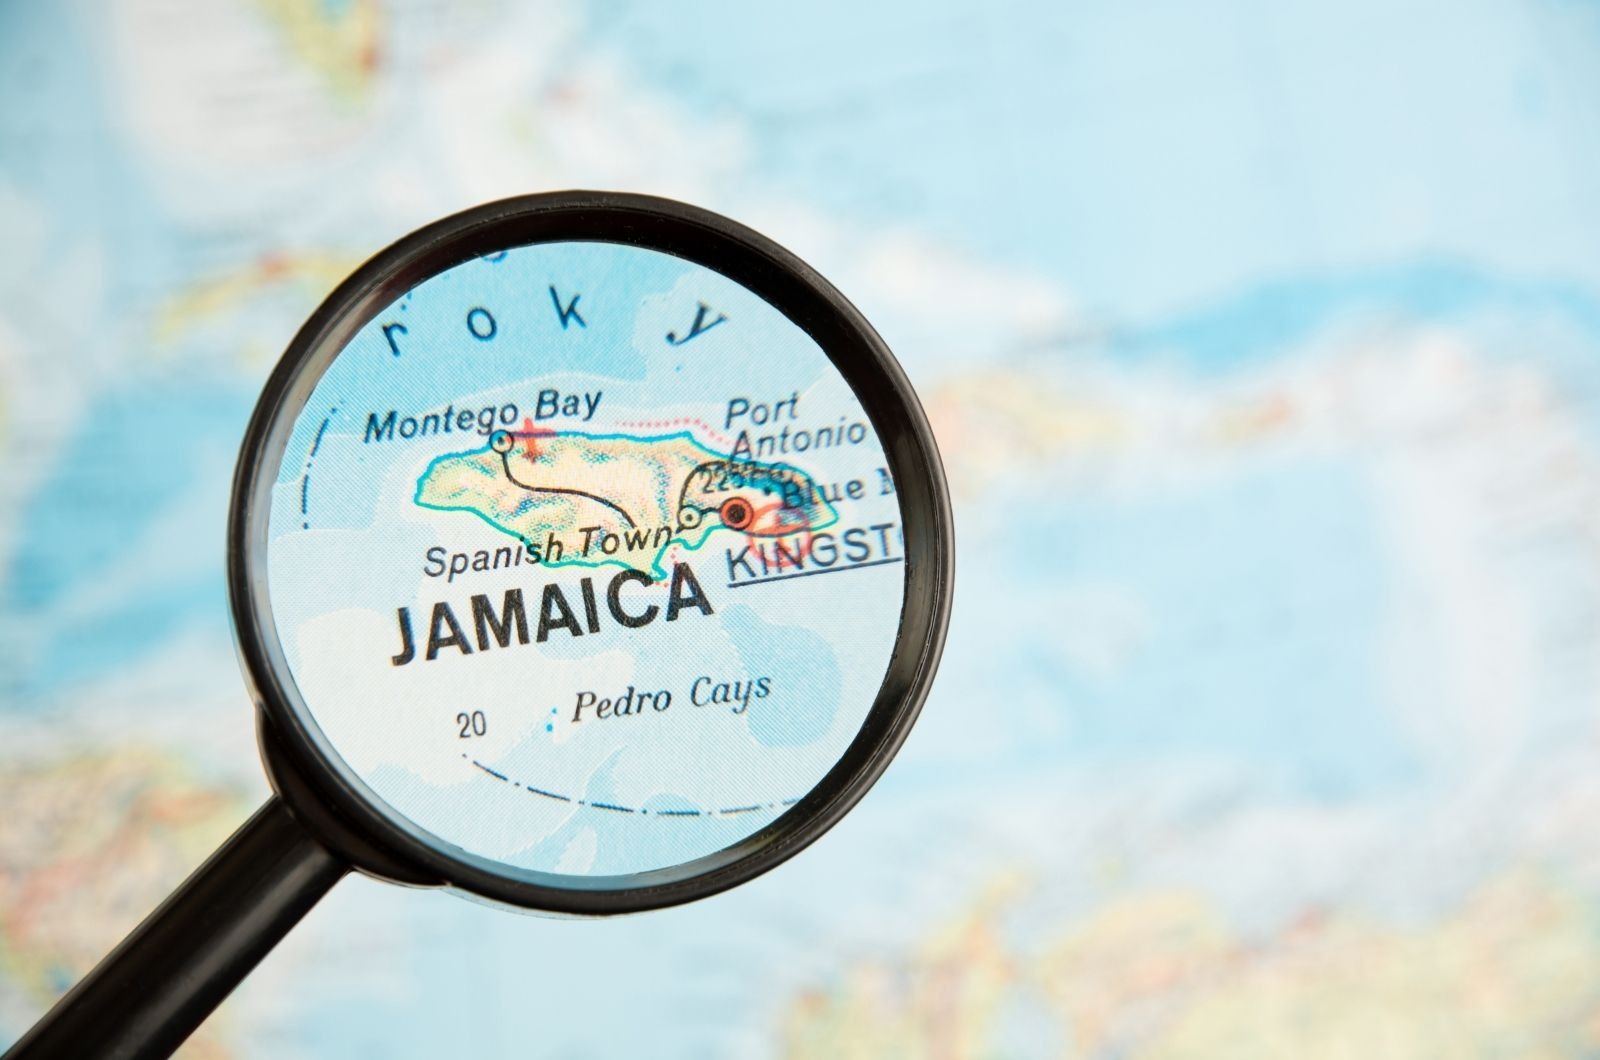 Fakta o Jamajce